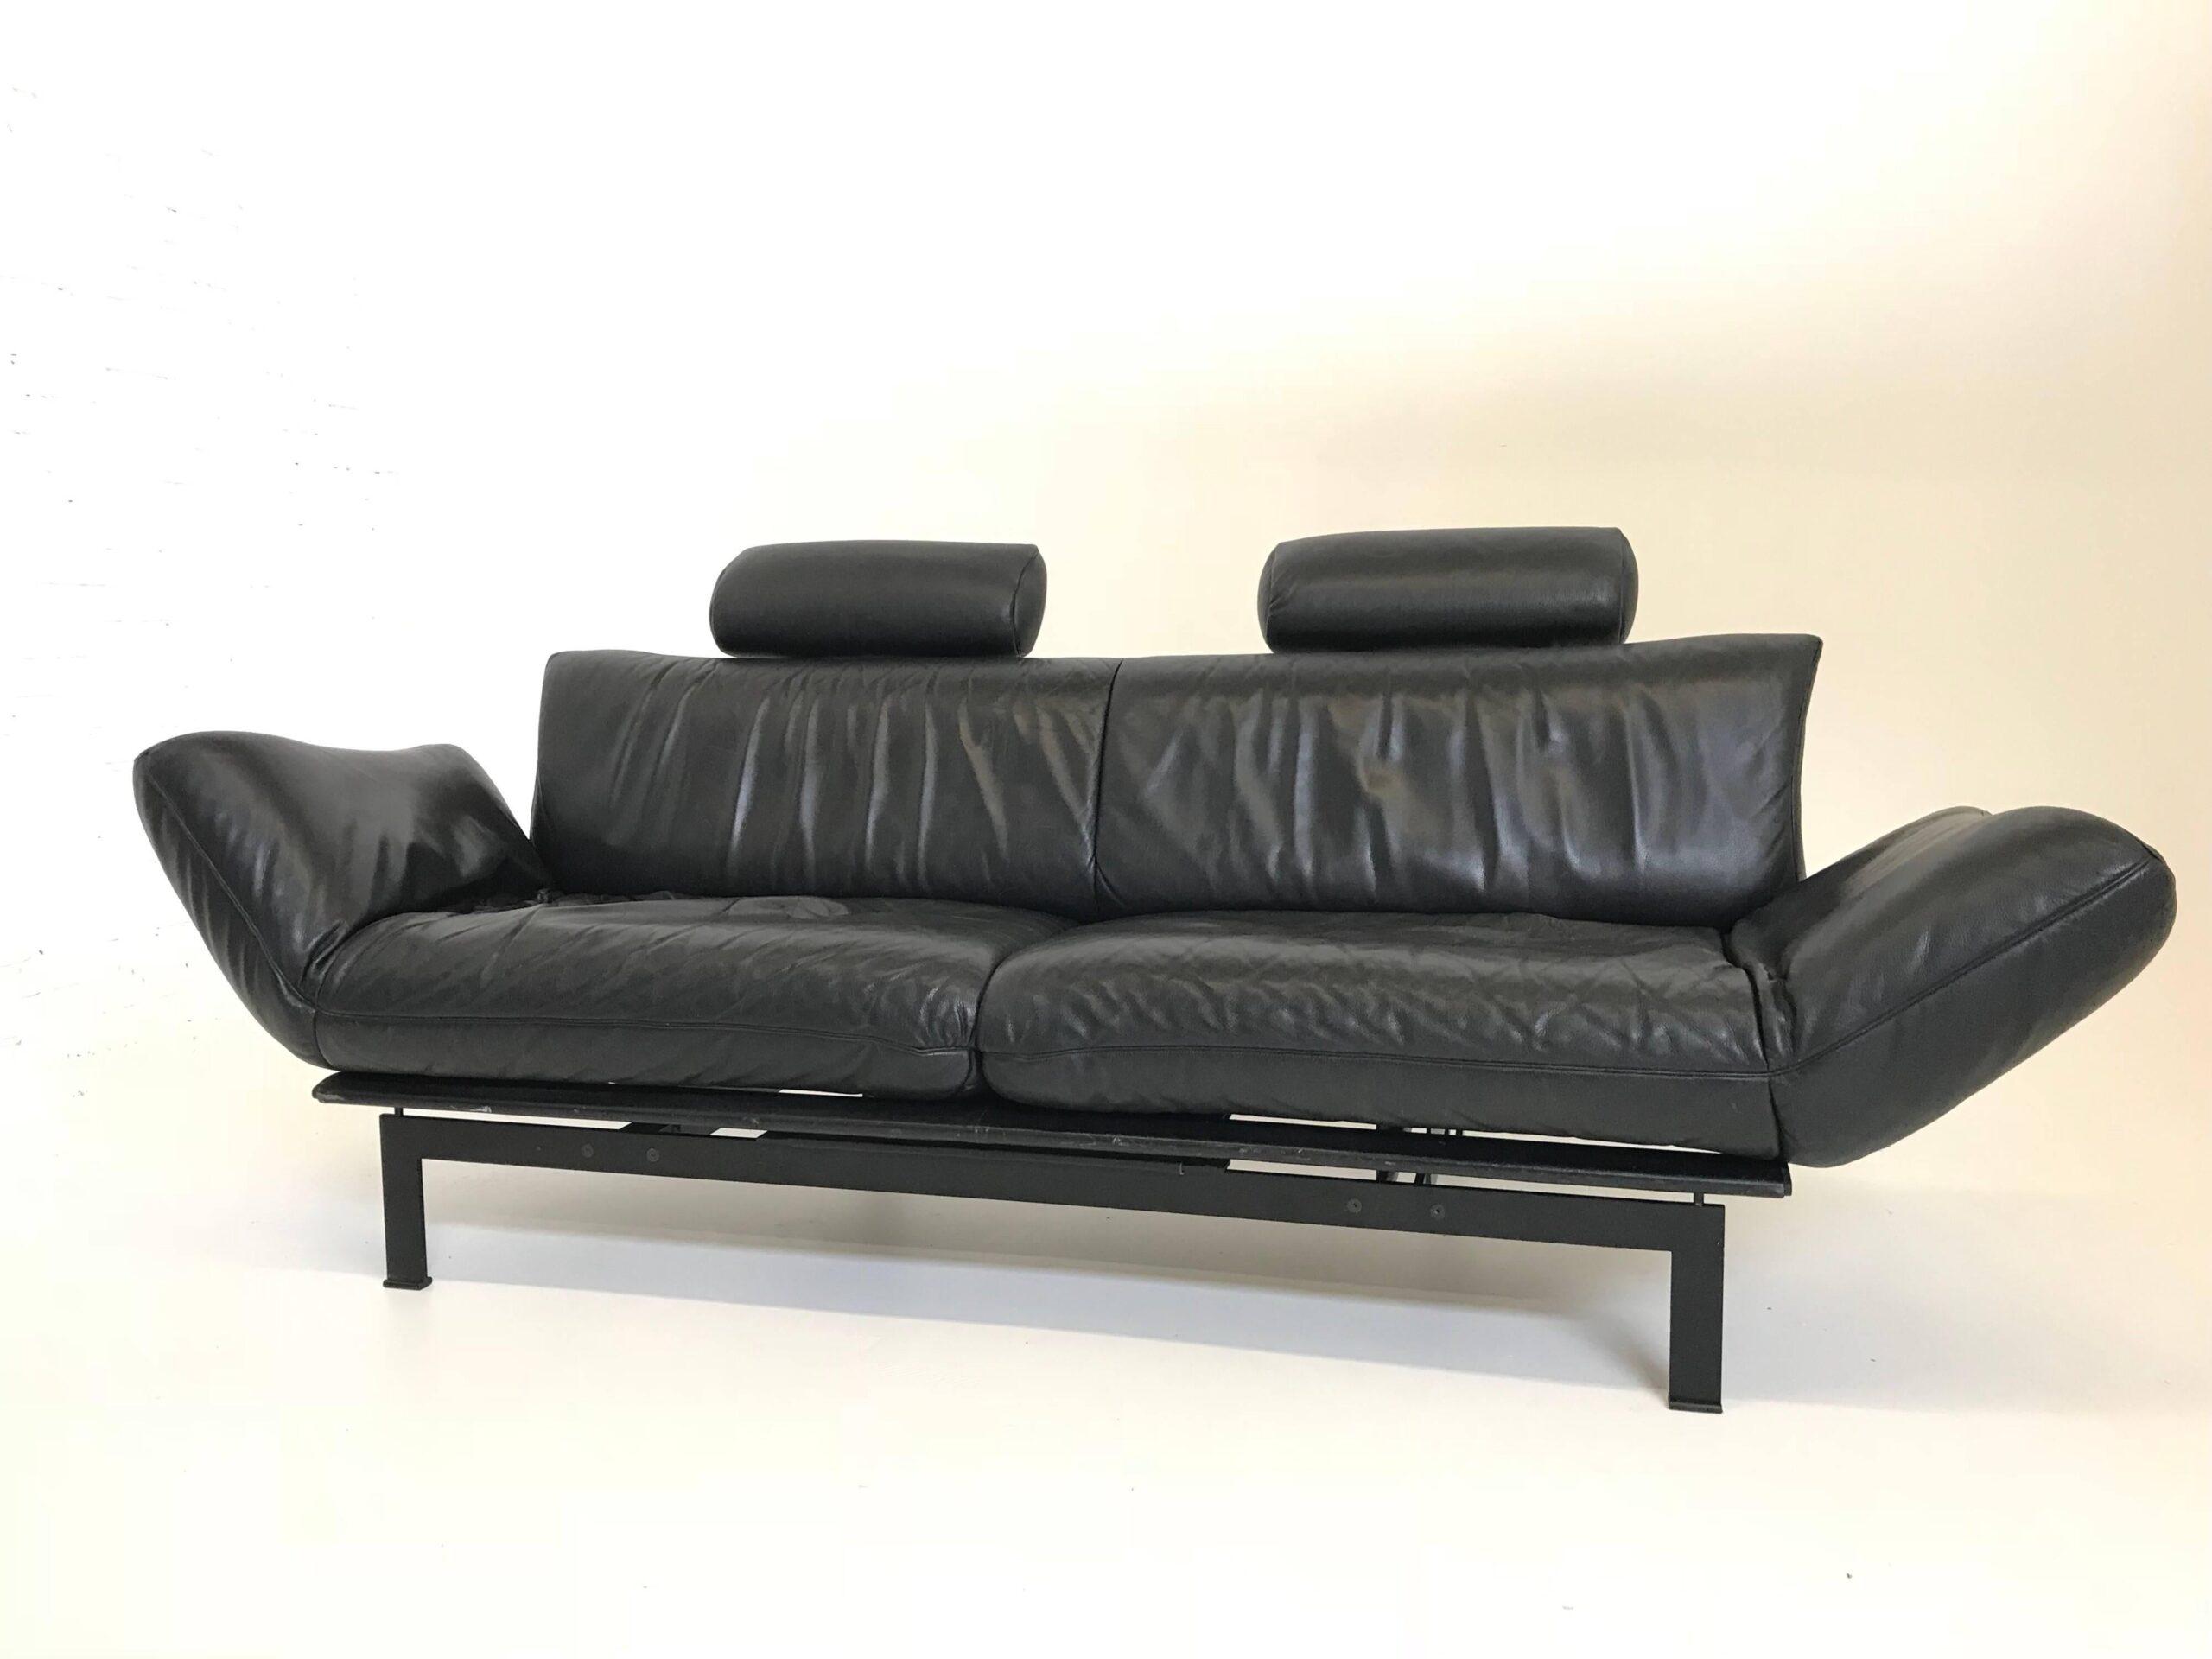 Full Size of De Sede Sofa Ds 140 Black Chaise Lounge At 1stdibs Badezimmer Armaturen Kreidetafel Küche Led Deckenleuchte Wohnzimmer Neu Gestalten Microfaser Deckenlampe Sofa De Sede Sofa